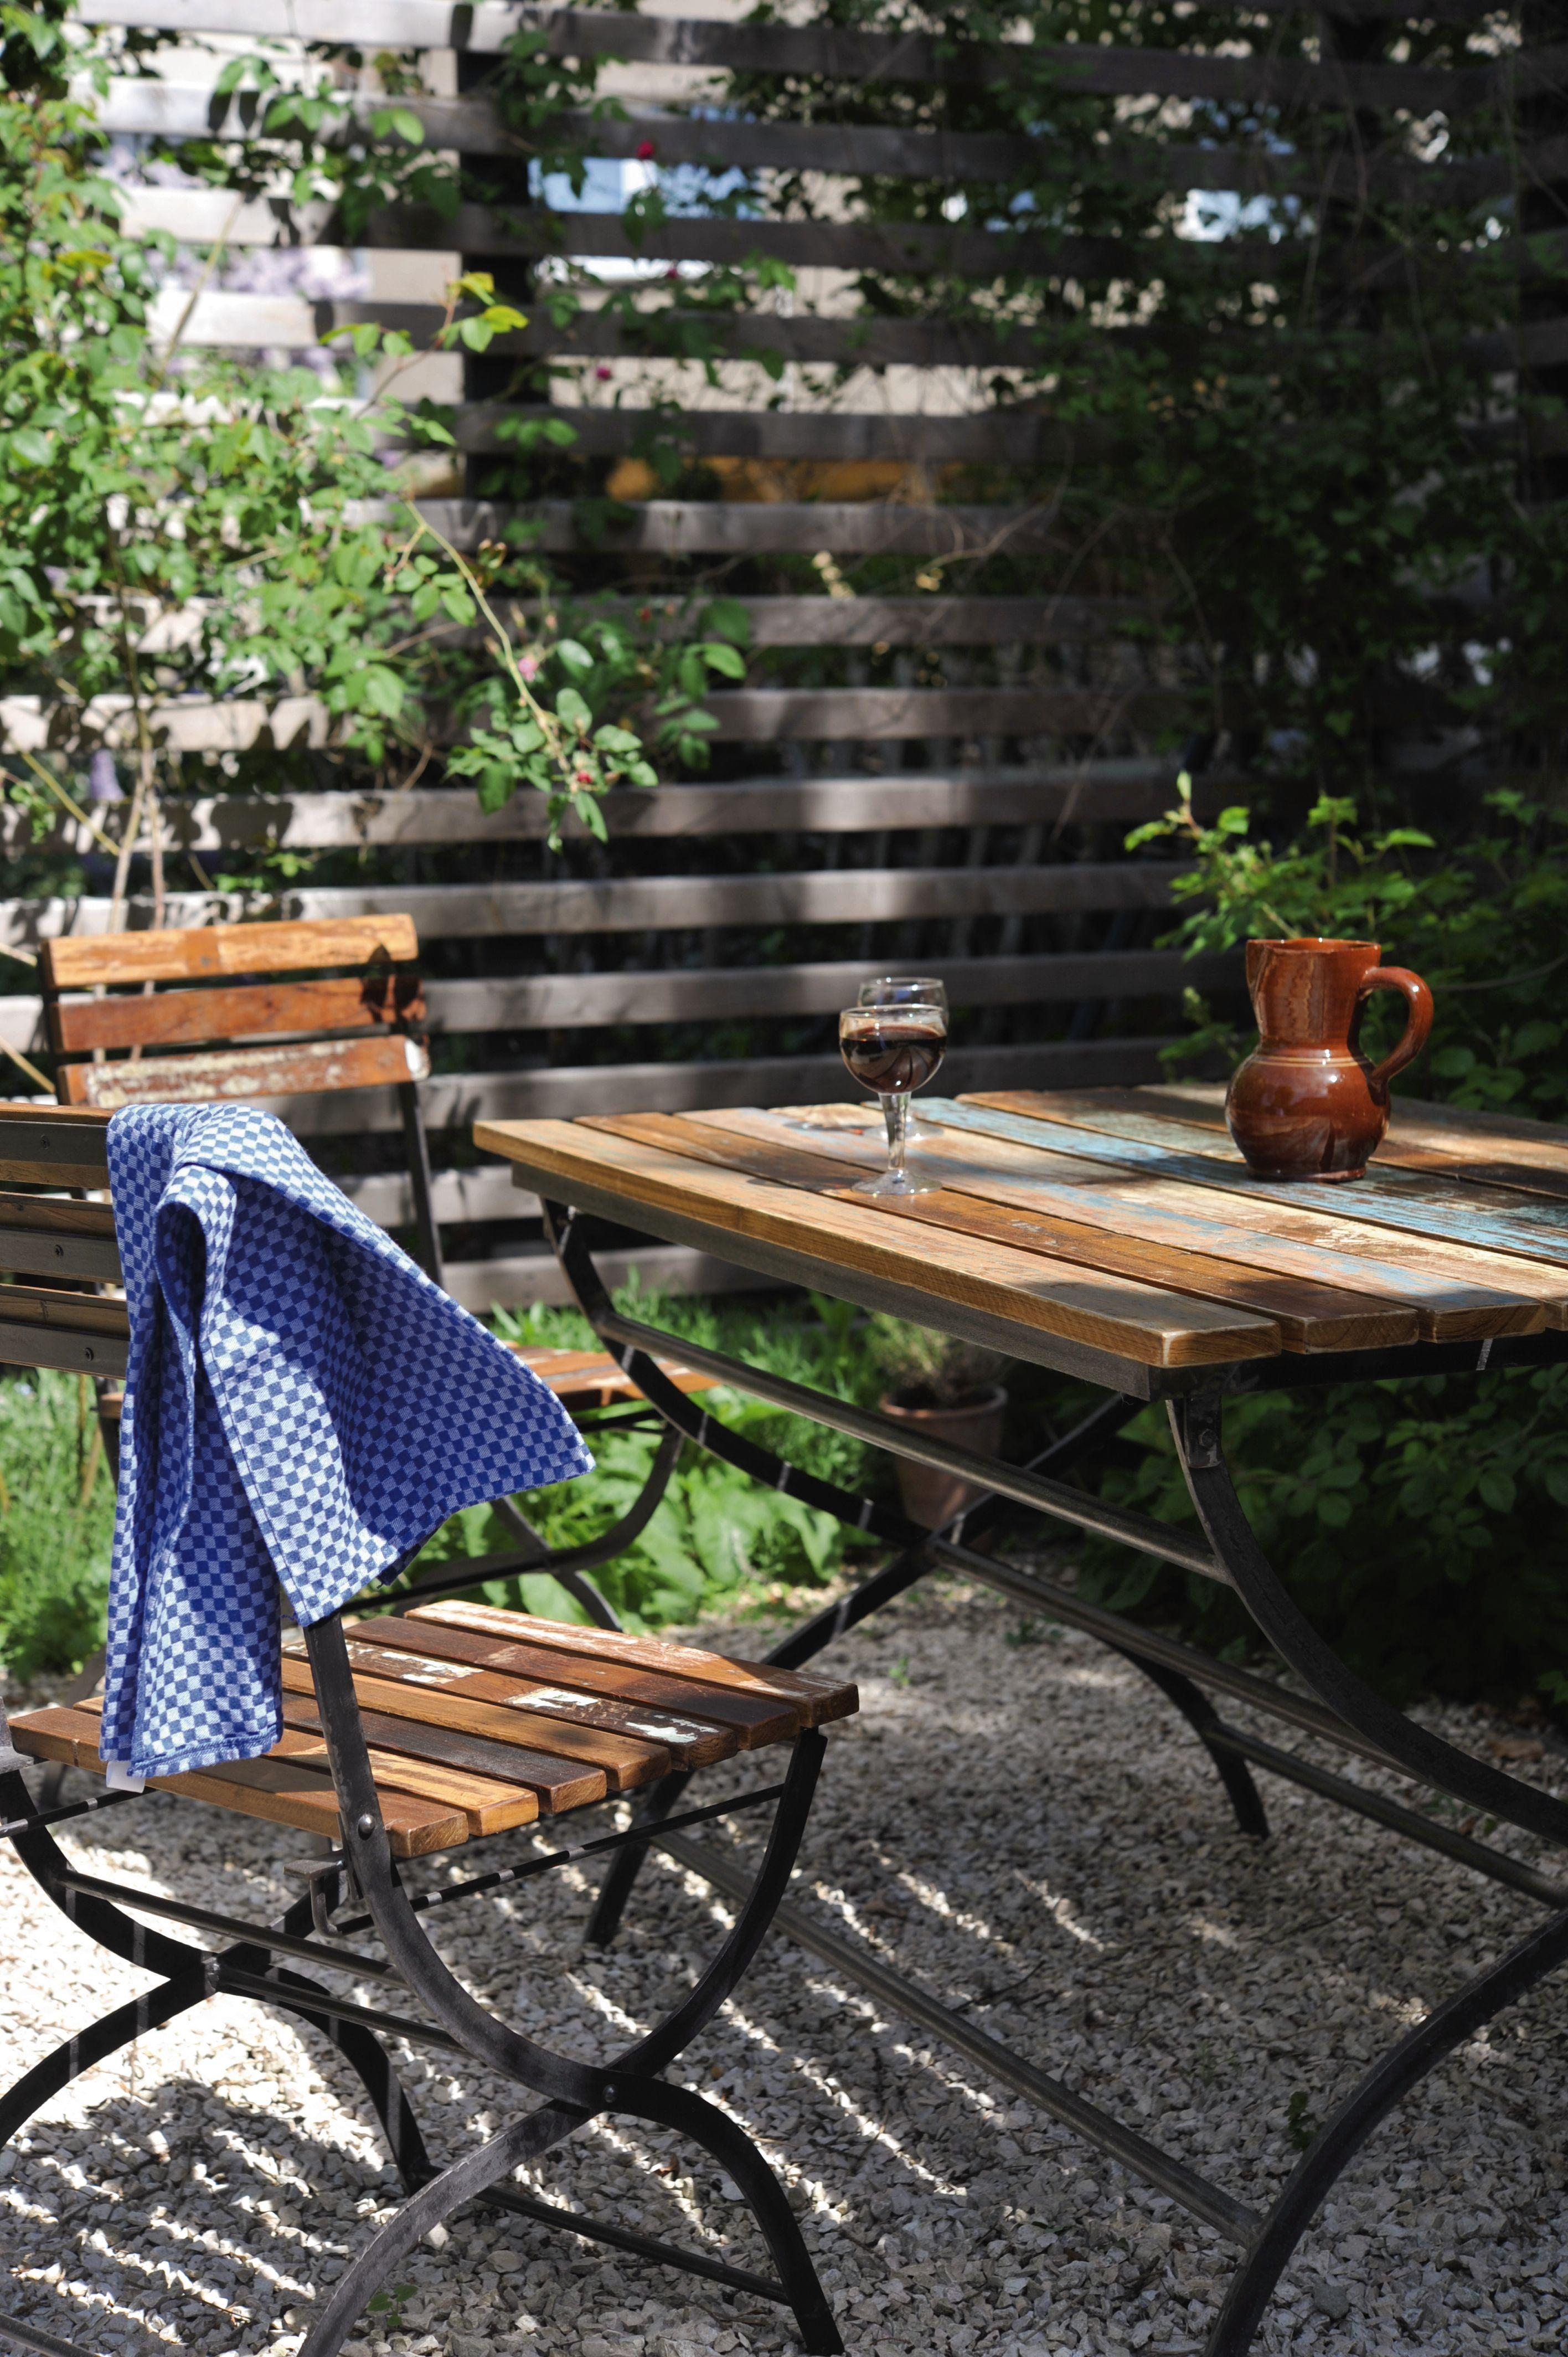 Gartenmobel Aus Recyceltem Hartholz Gartenmobel Klappbarer Gartentisch Garten